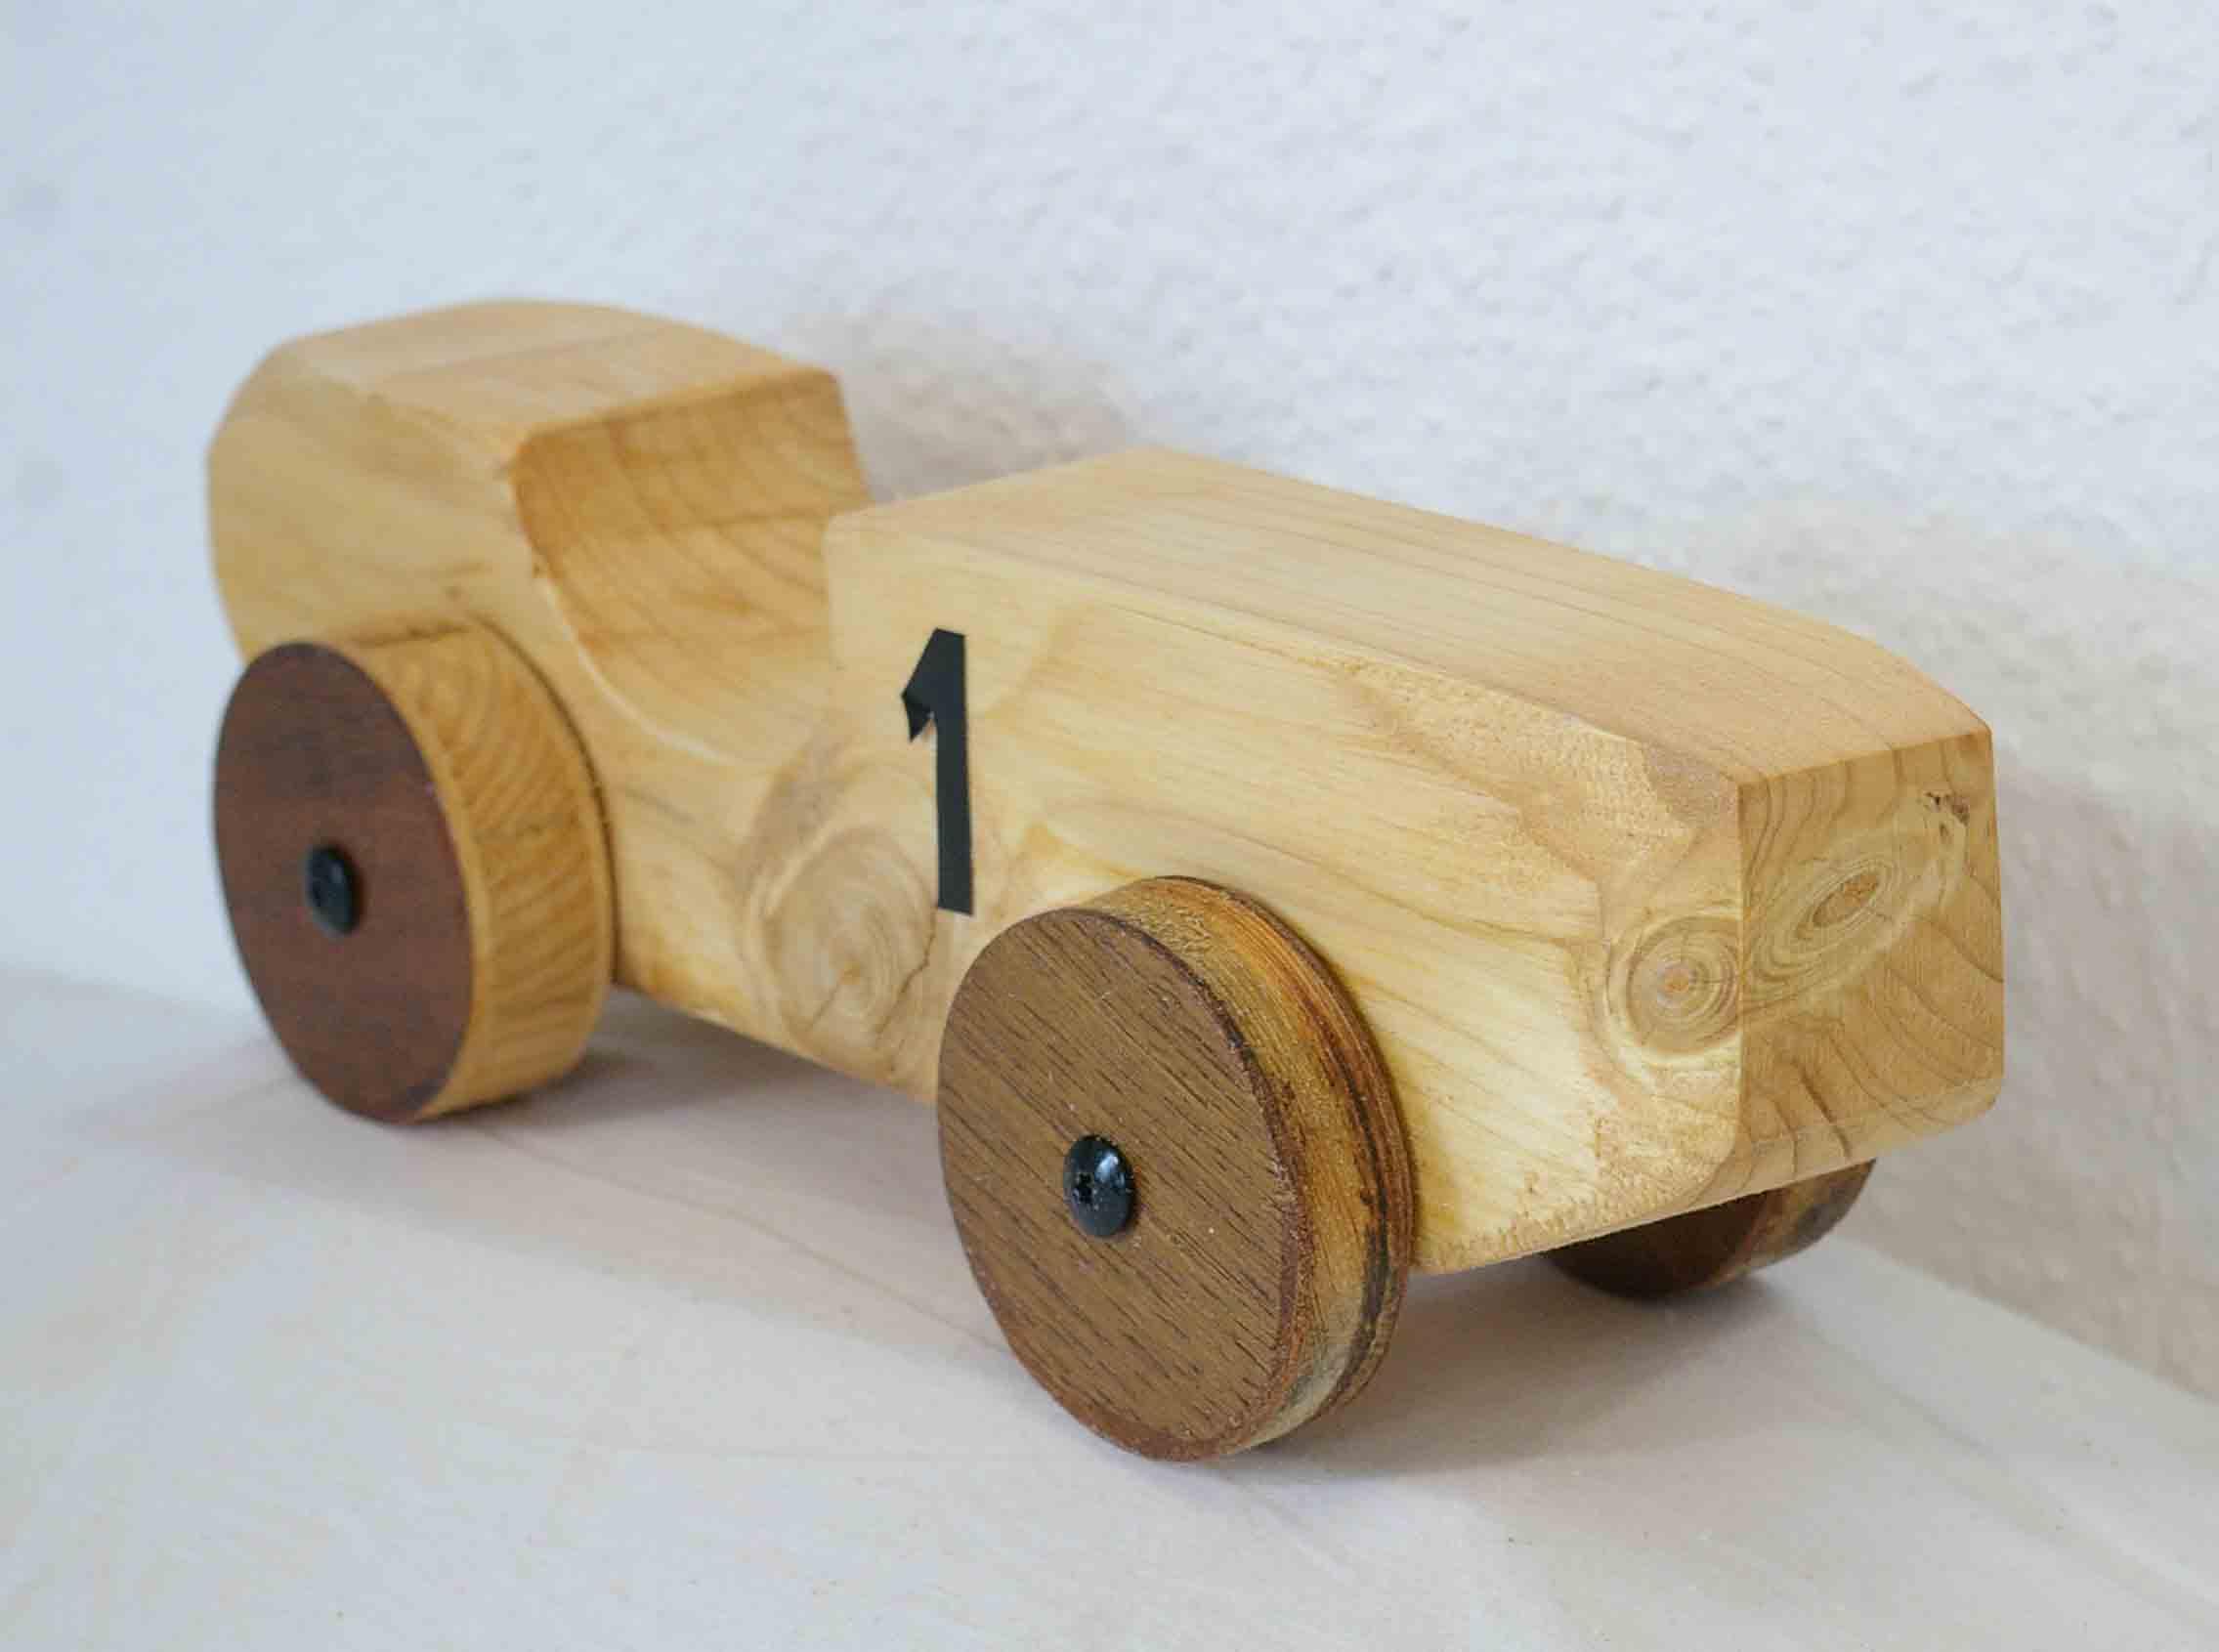 Holzauto selber bauen kinderspielzeug aus holz